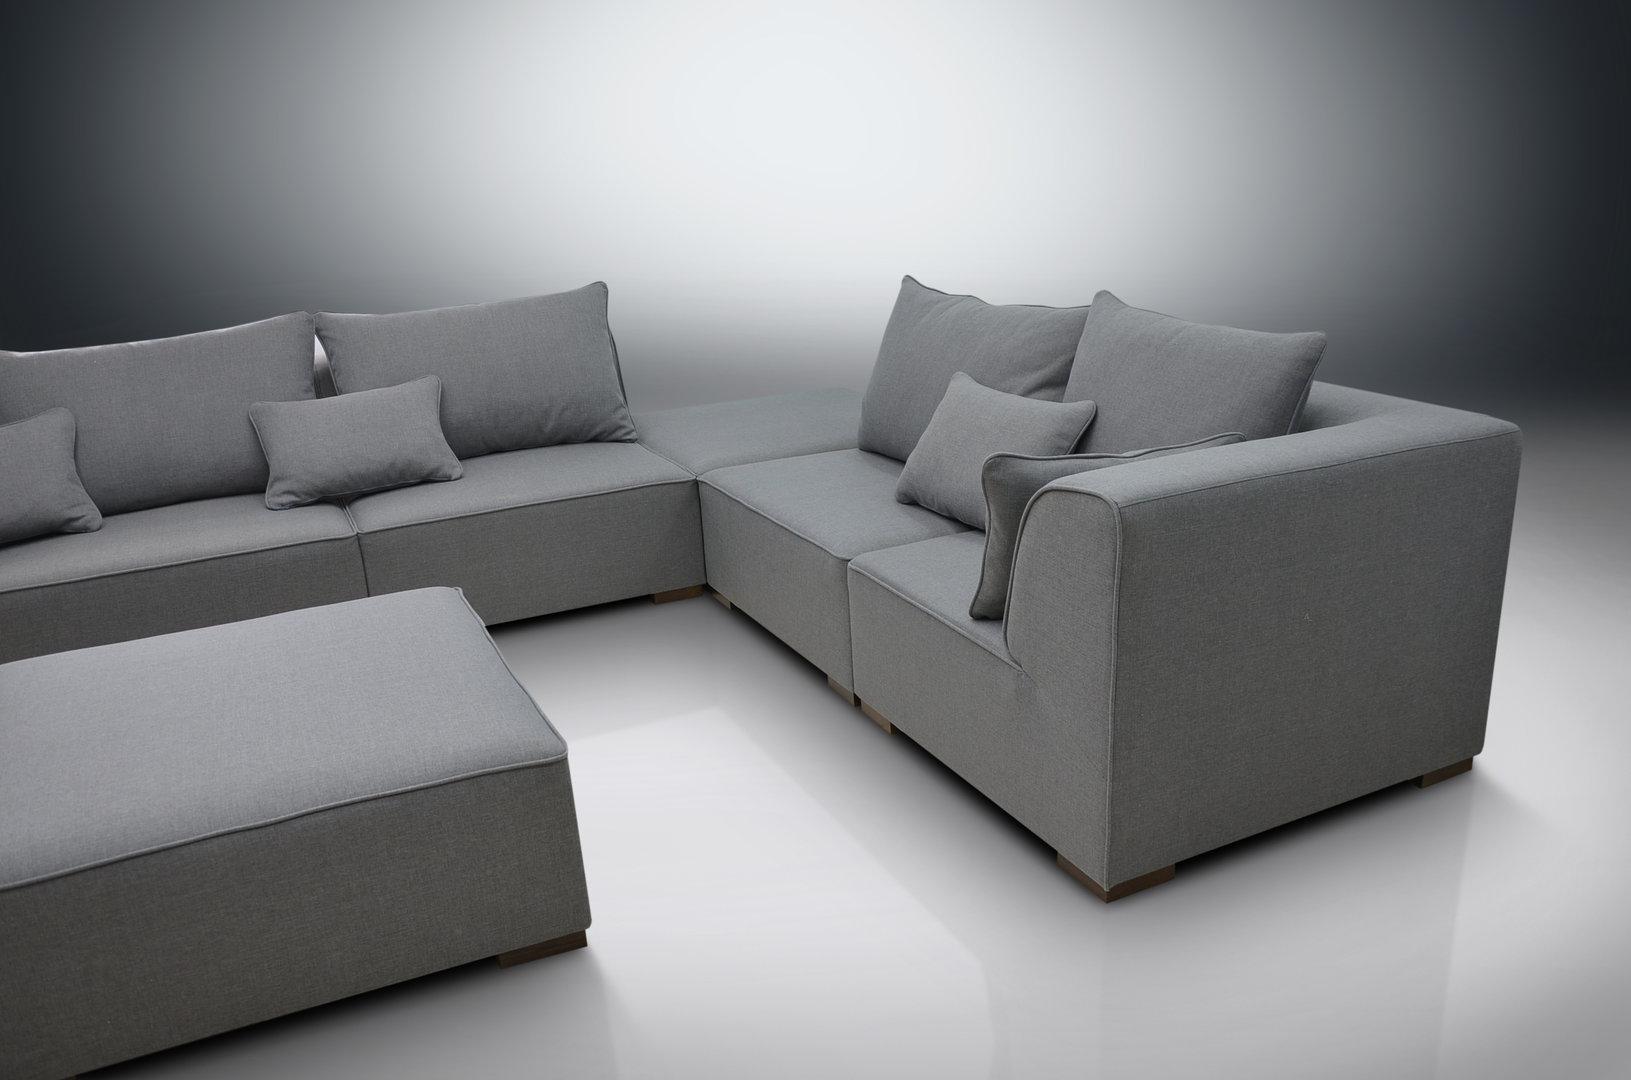 Modular Sofa Primo, 2Xcorners, 3Xchairs, 2Xfootstools Inside Dream Navy 3 Piece Modular Sofas (View 12 of 15)